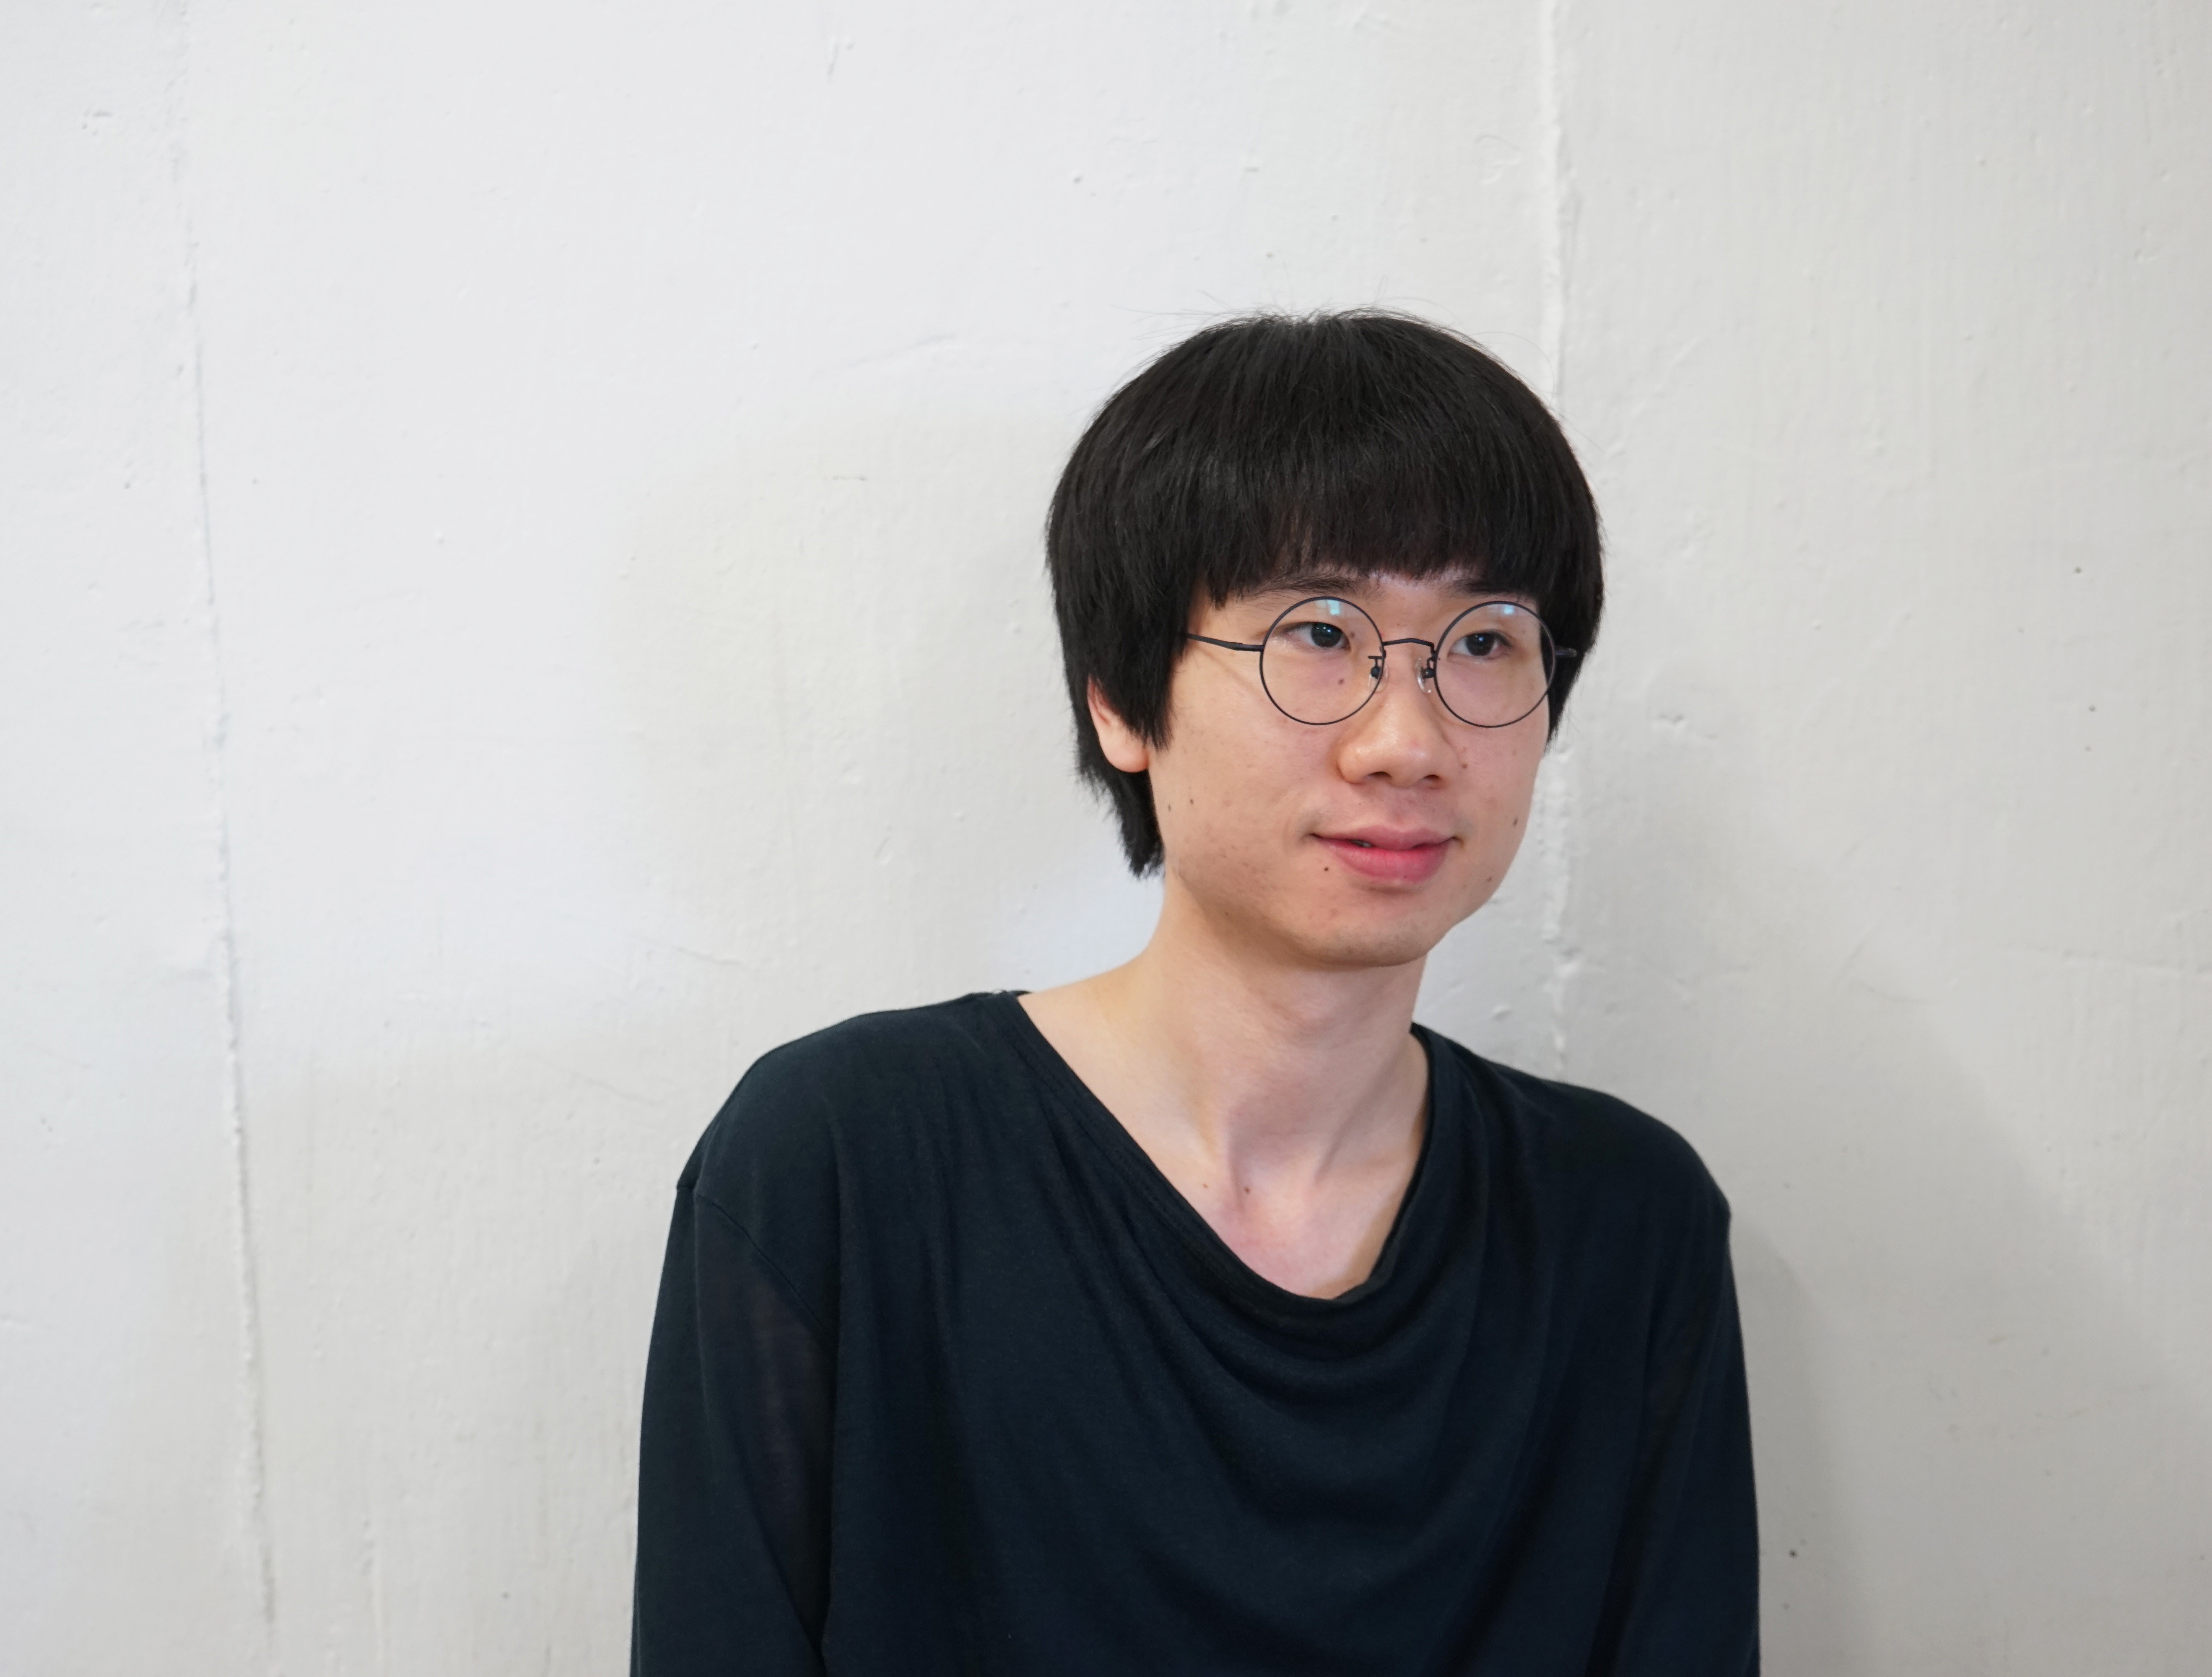 Lee Siu Hin_profile pic